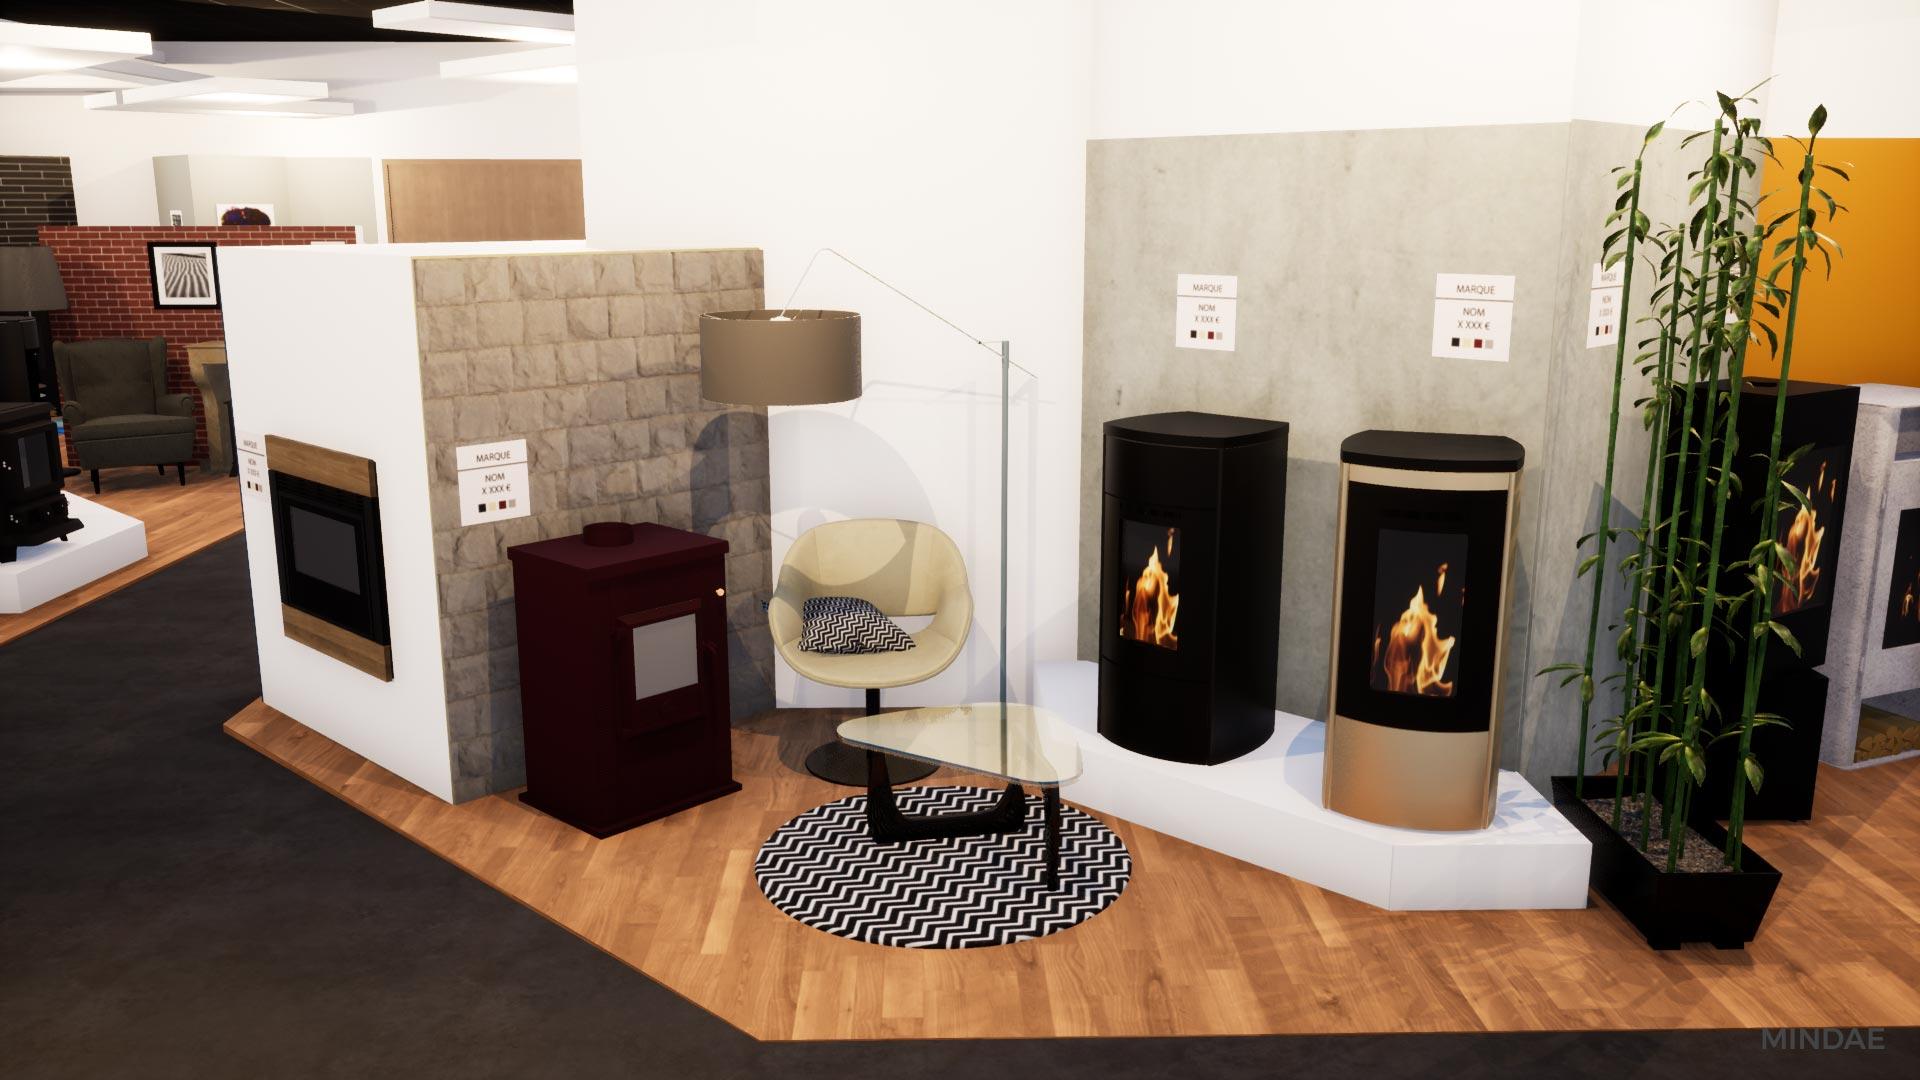 Mindae_3D_projet_agencement_poele_bois_cheminee_showroom_flamdesign_magasin_mondeville-(5)